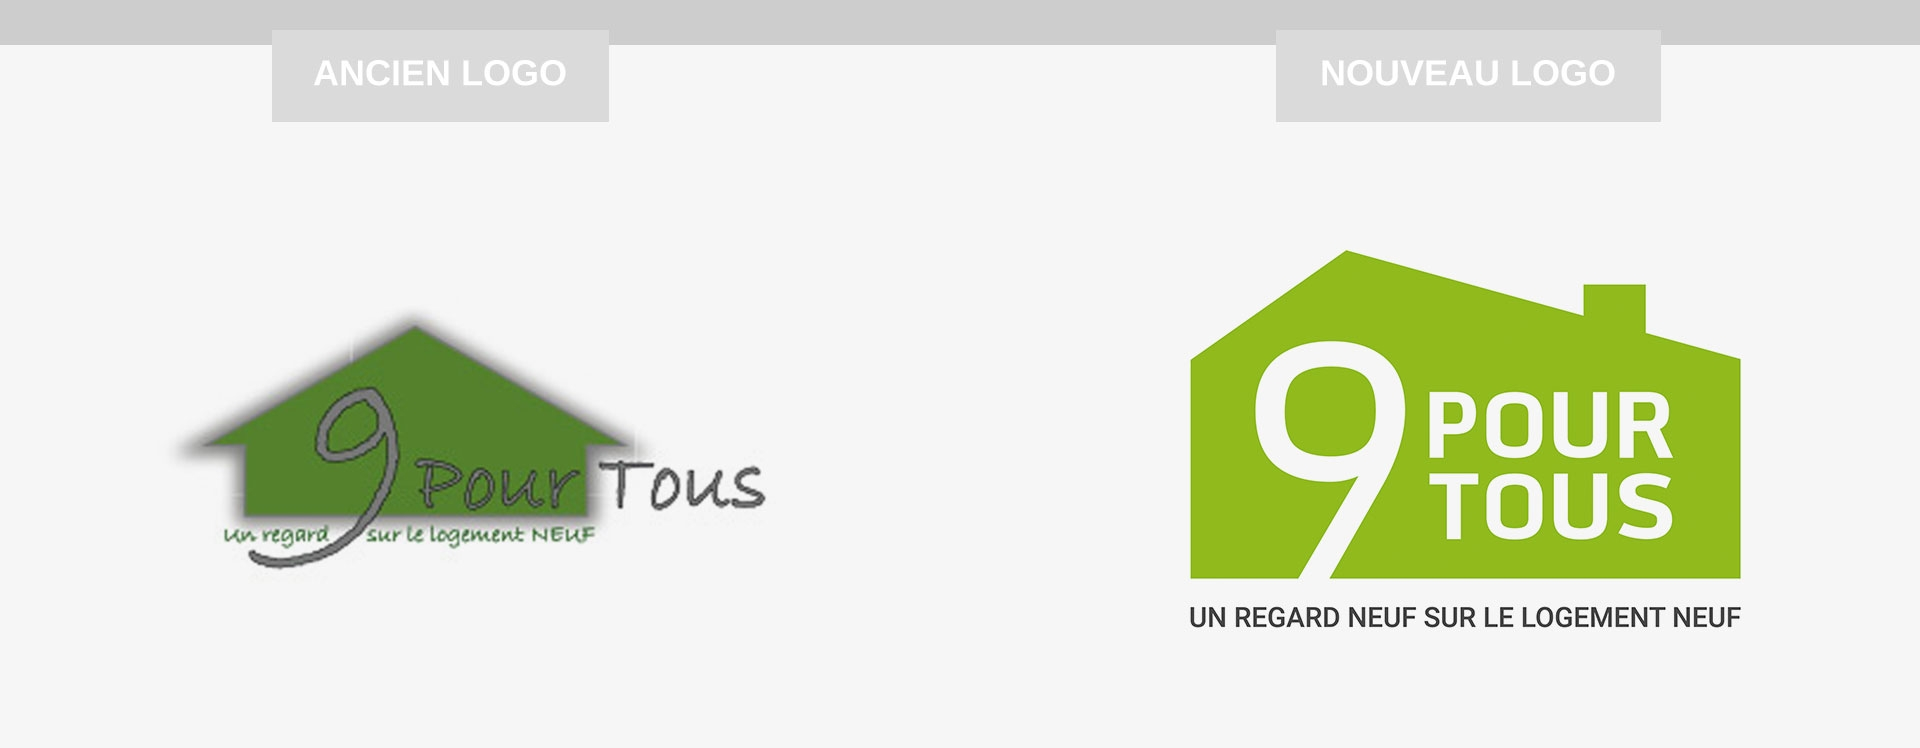 professionnels-print-identite-visuelle-9pt-1